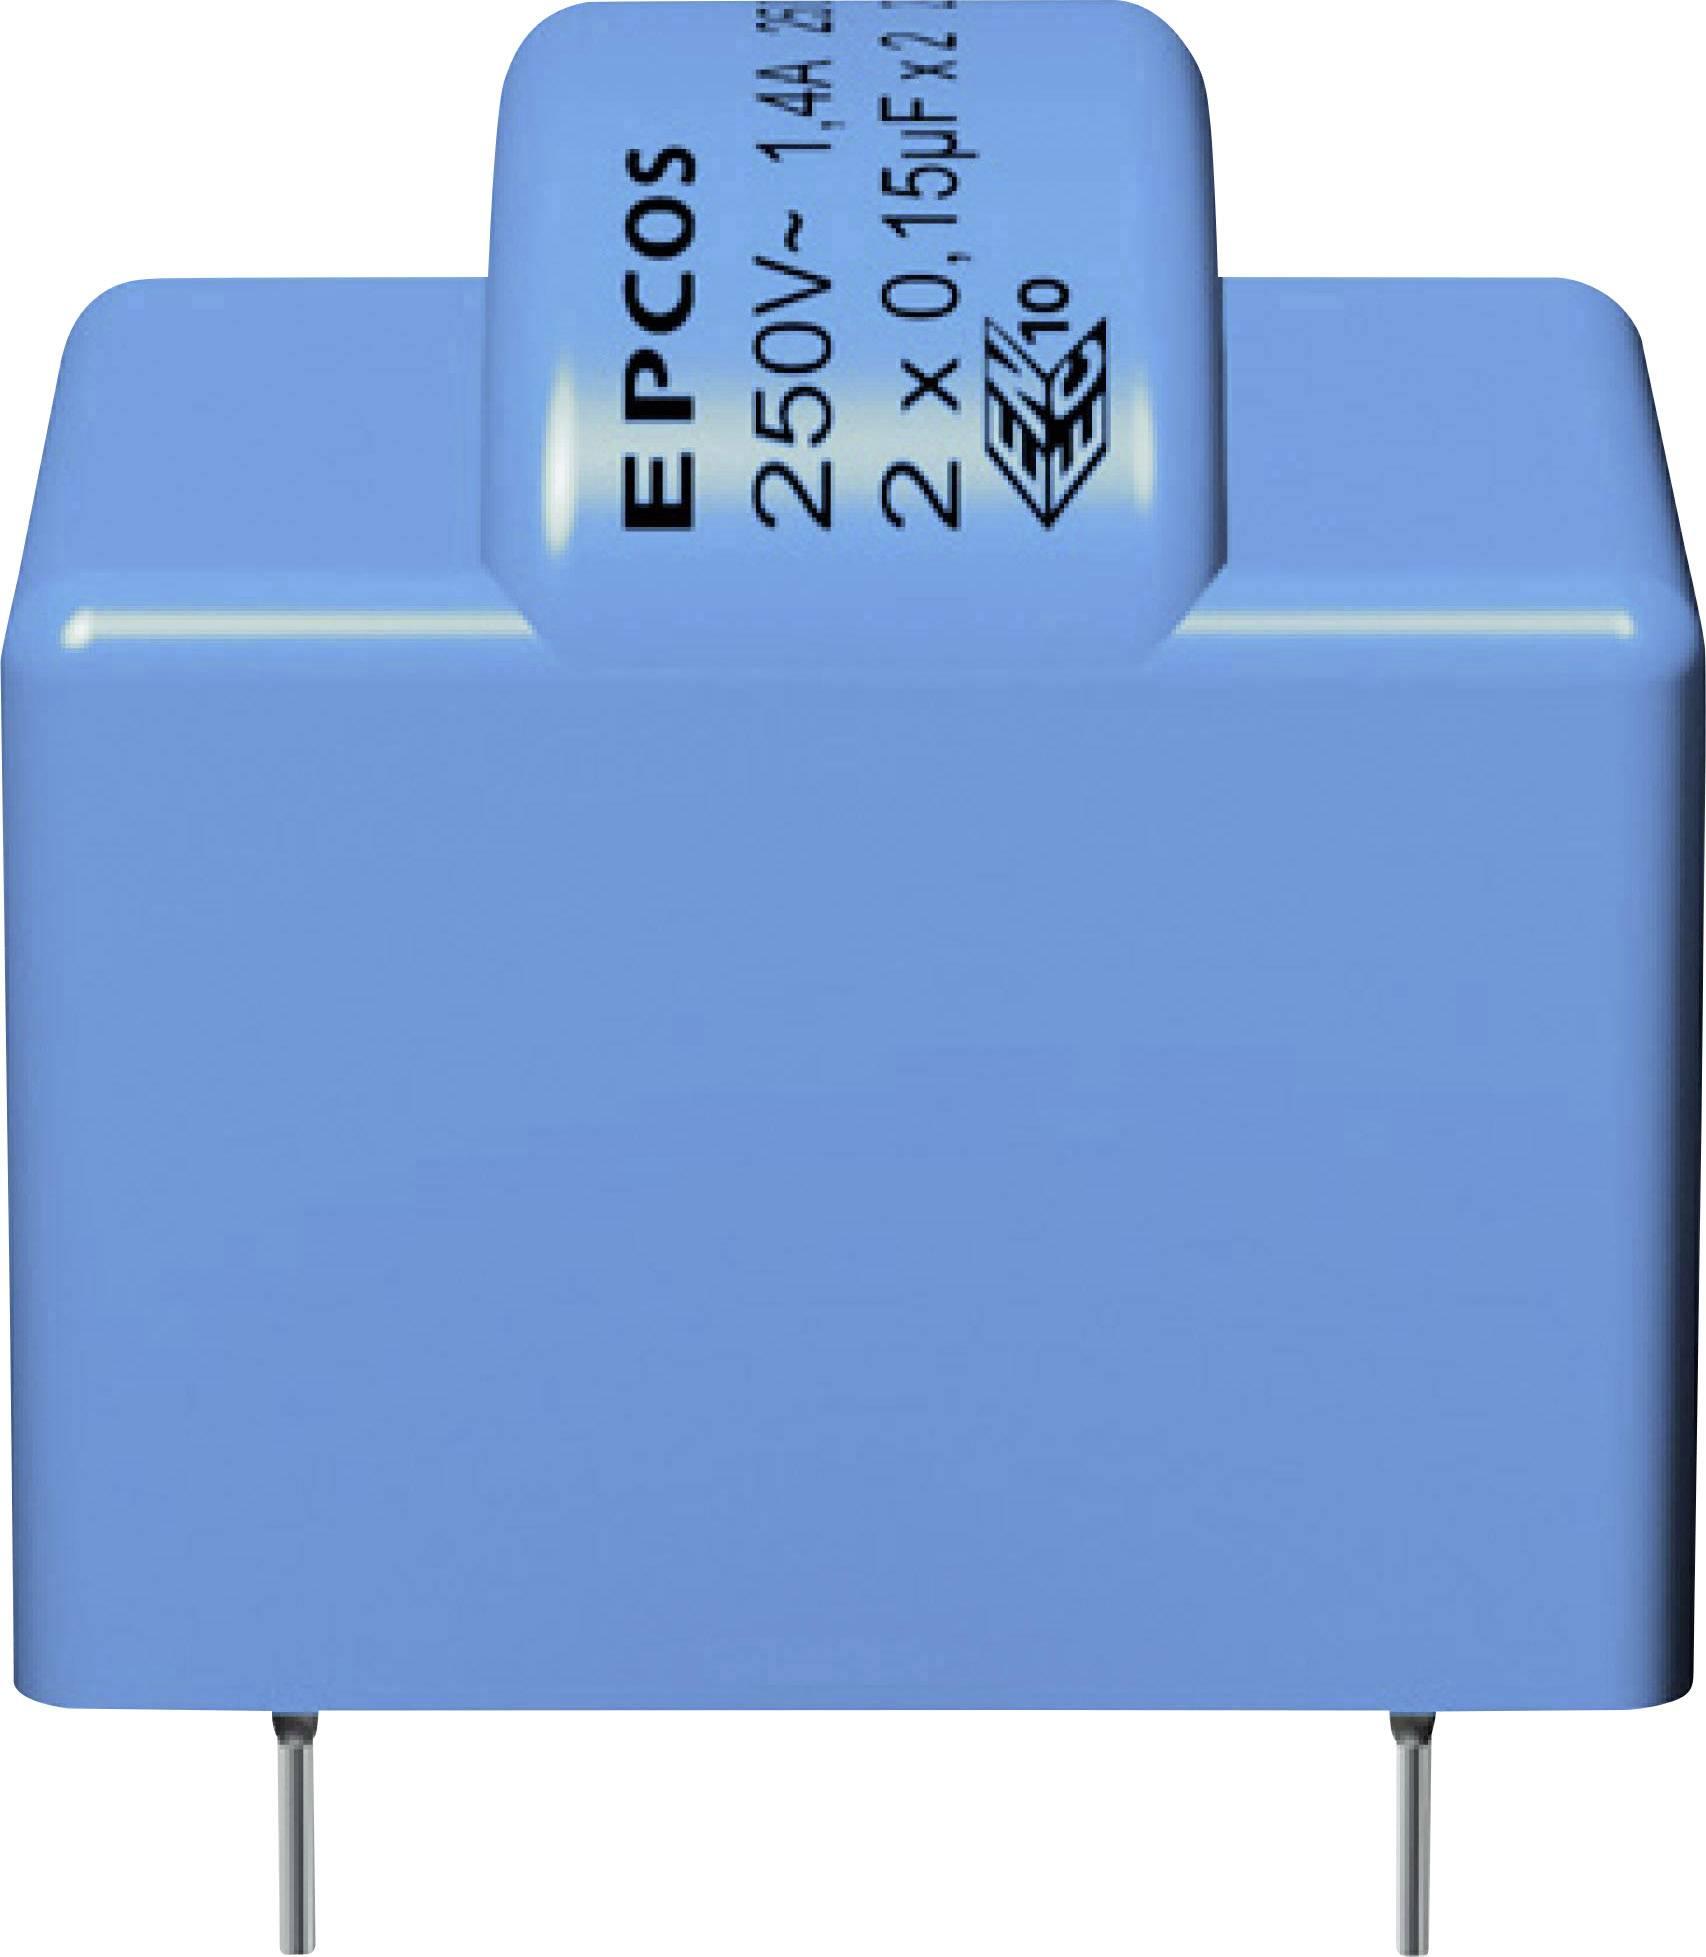 Síťový filtr Epcos, B84110B0000A014, 2 x 27 mH, 250 V, 2 x 1,4 A